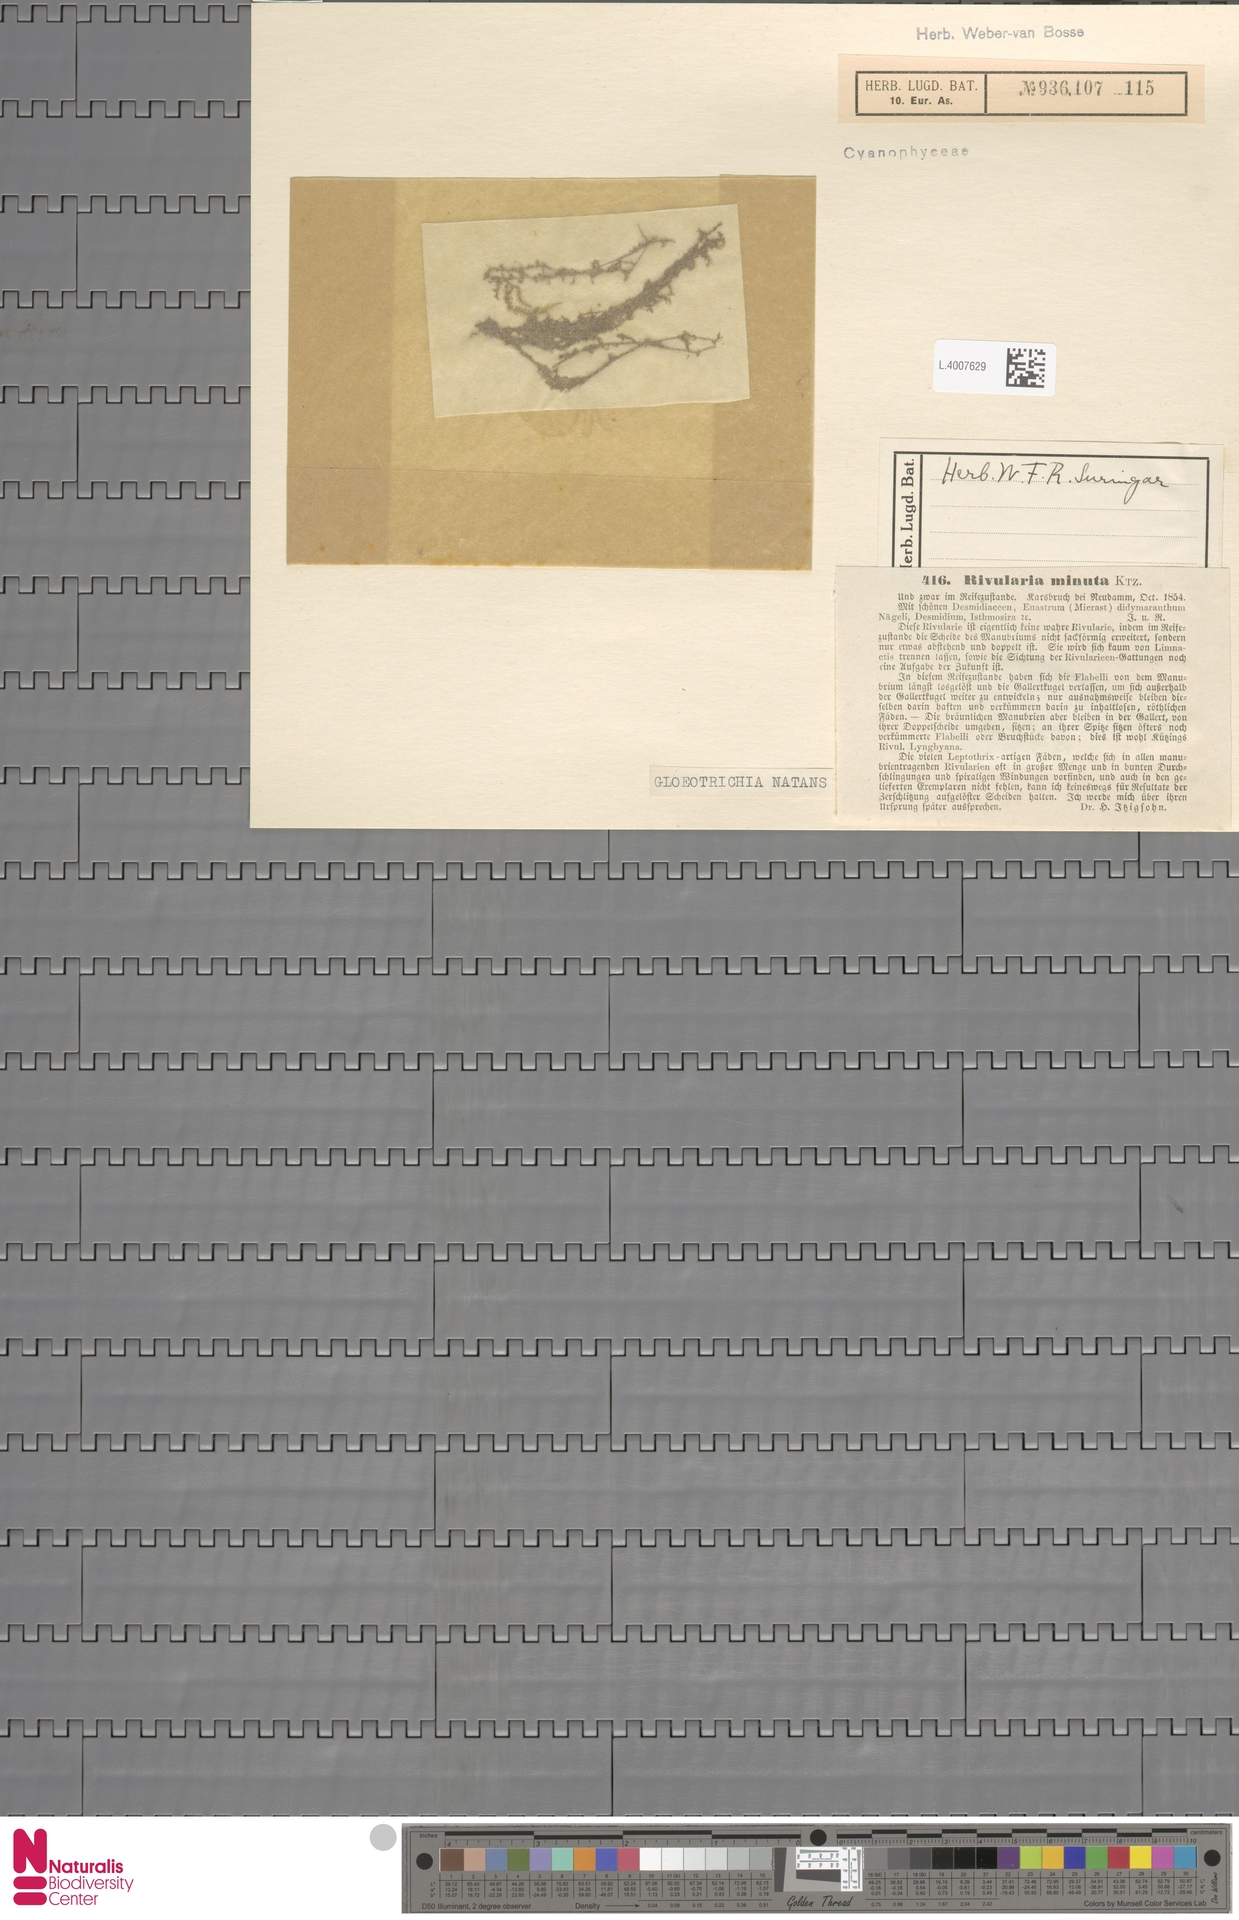 L.4007629 | Gloeotrichia natans (Hedw.) Rabenh. ex Bornet & Flahault